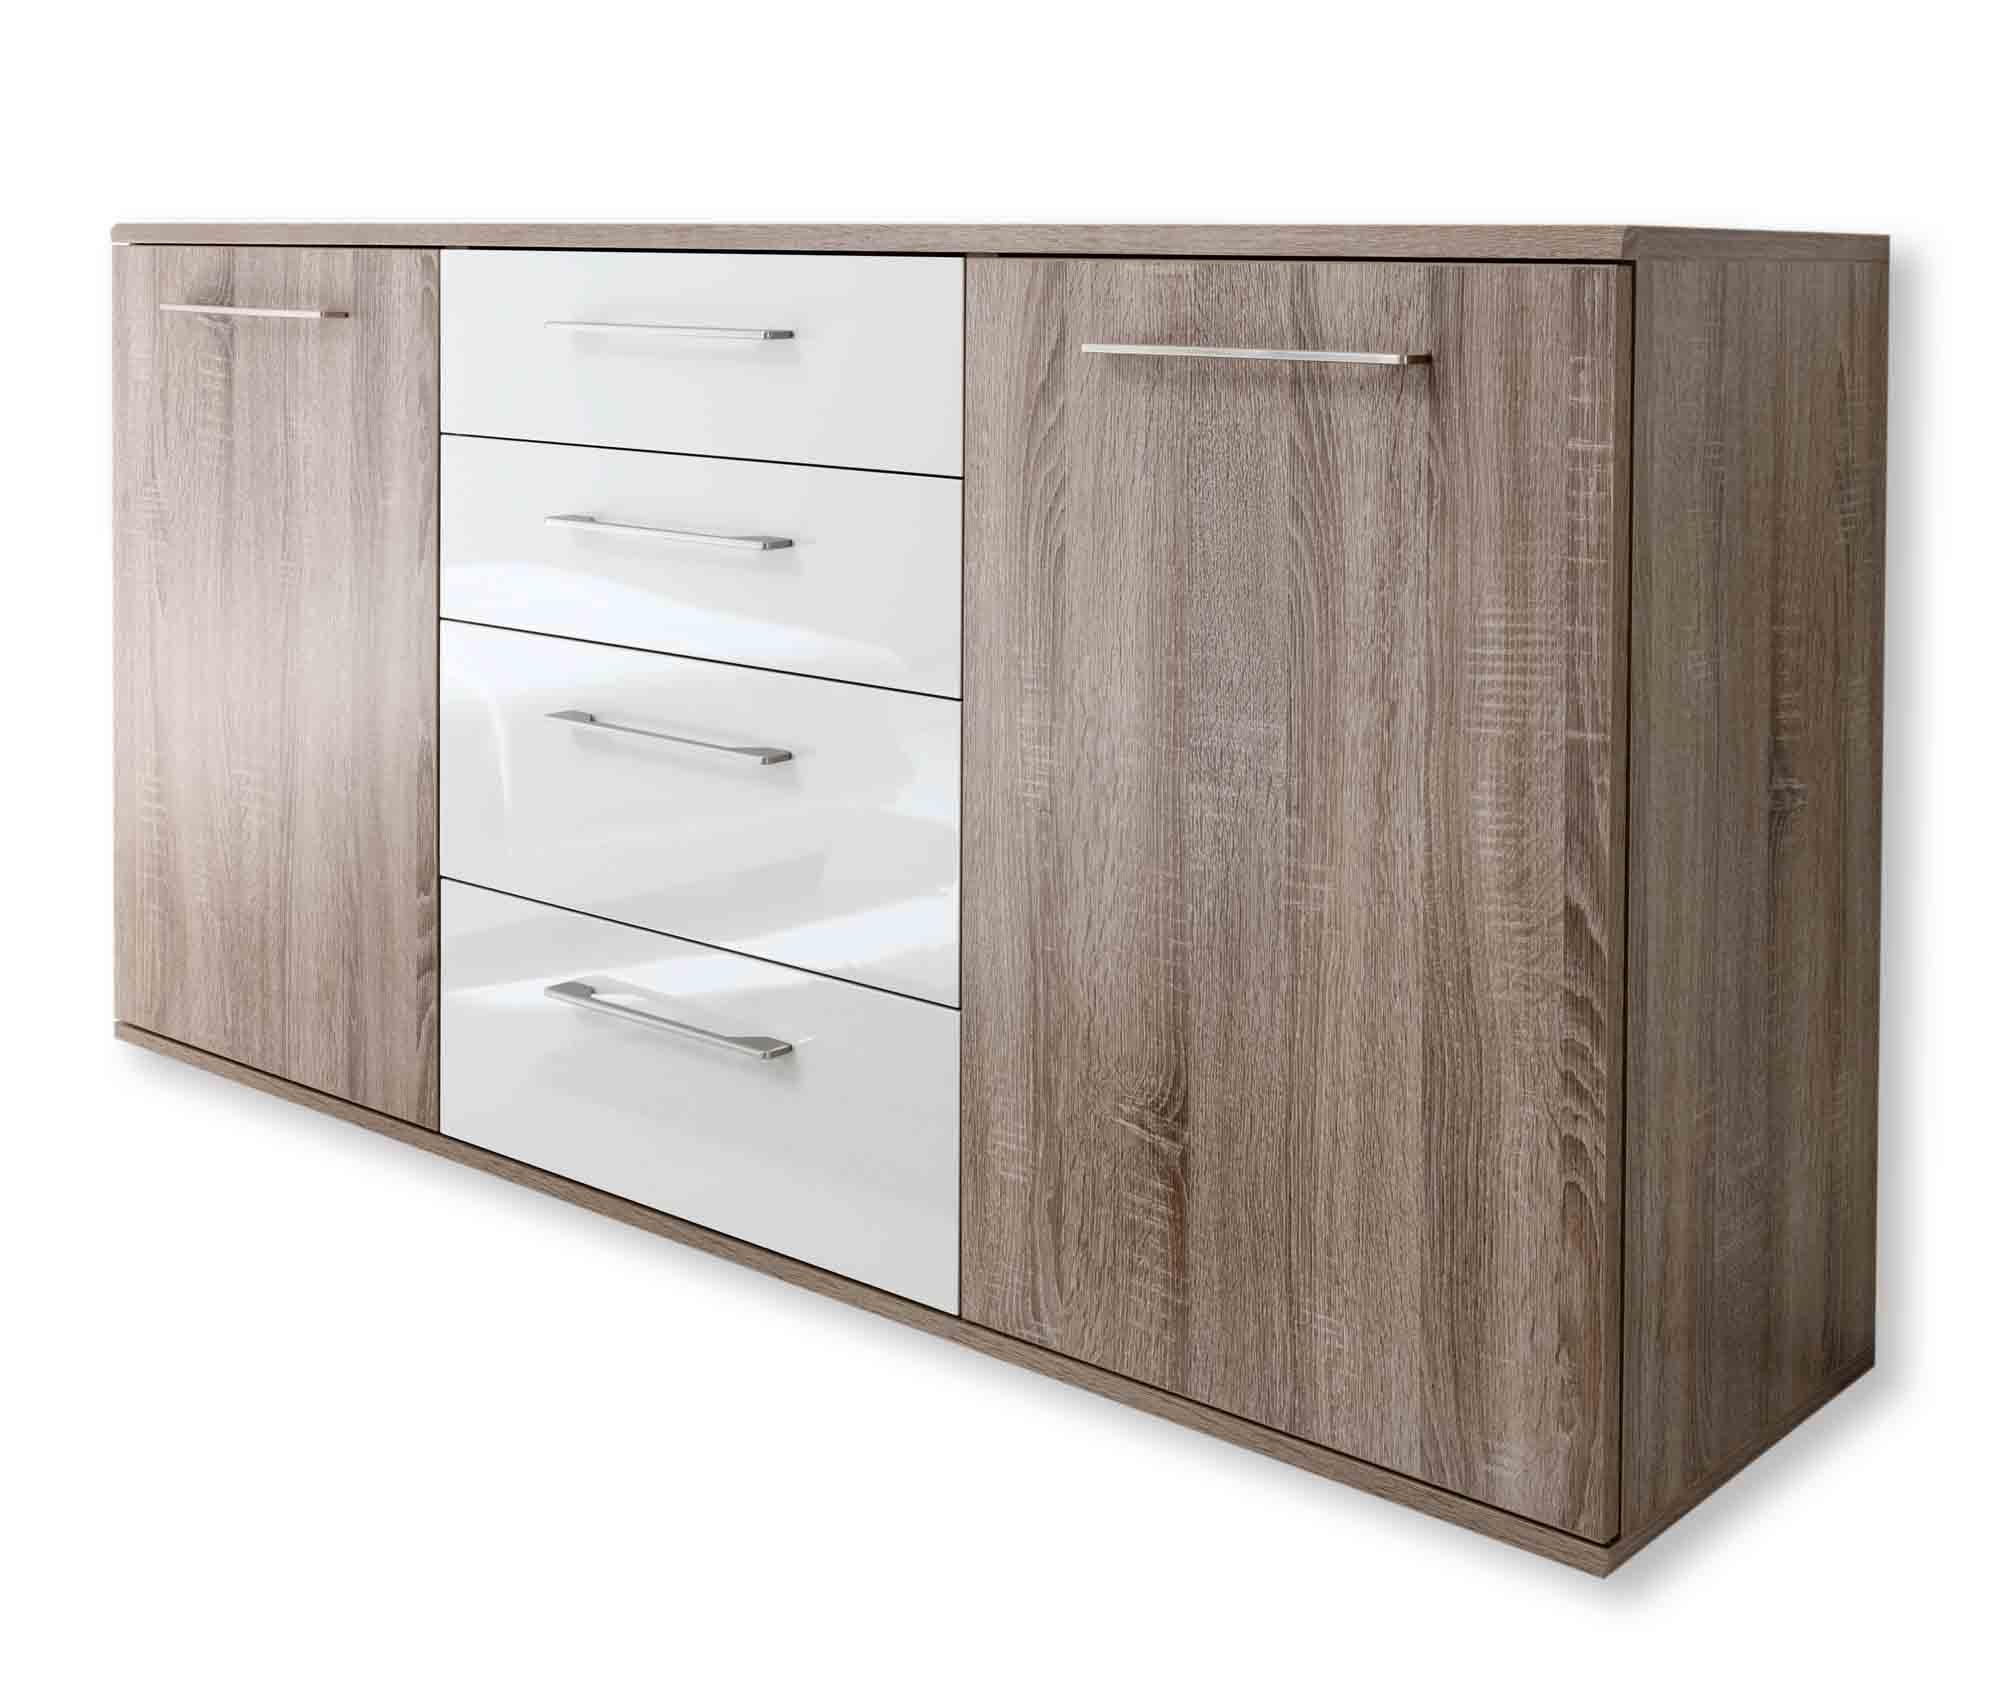 Kommode Luna Loddenkemper, online kaufen | Massiva Möbel.de